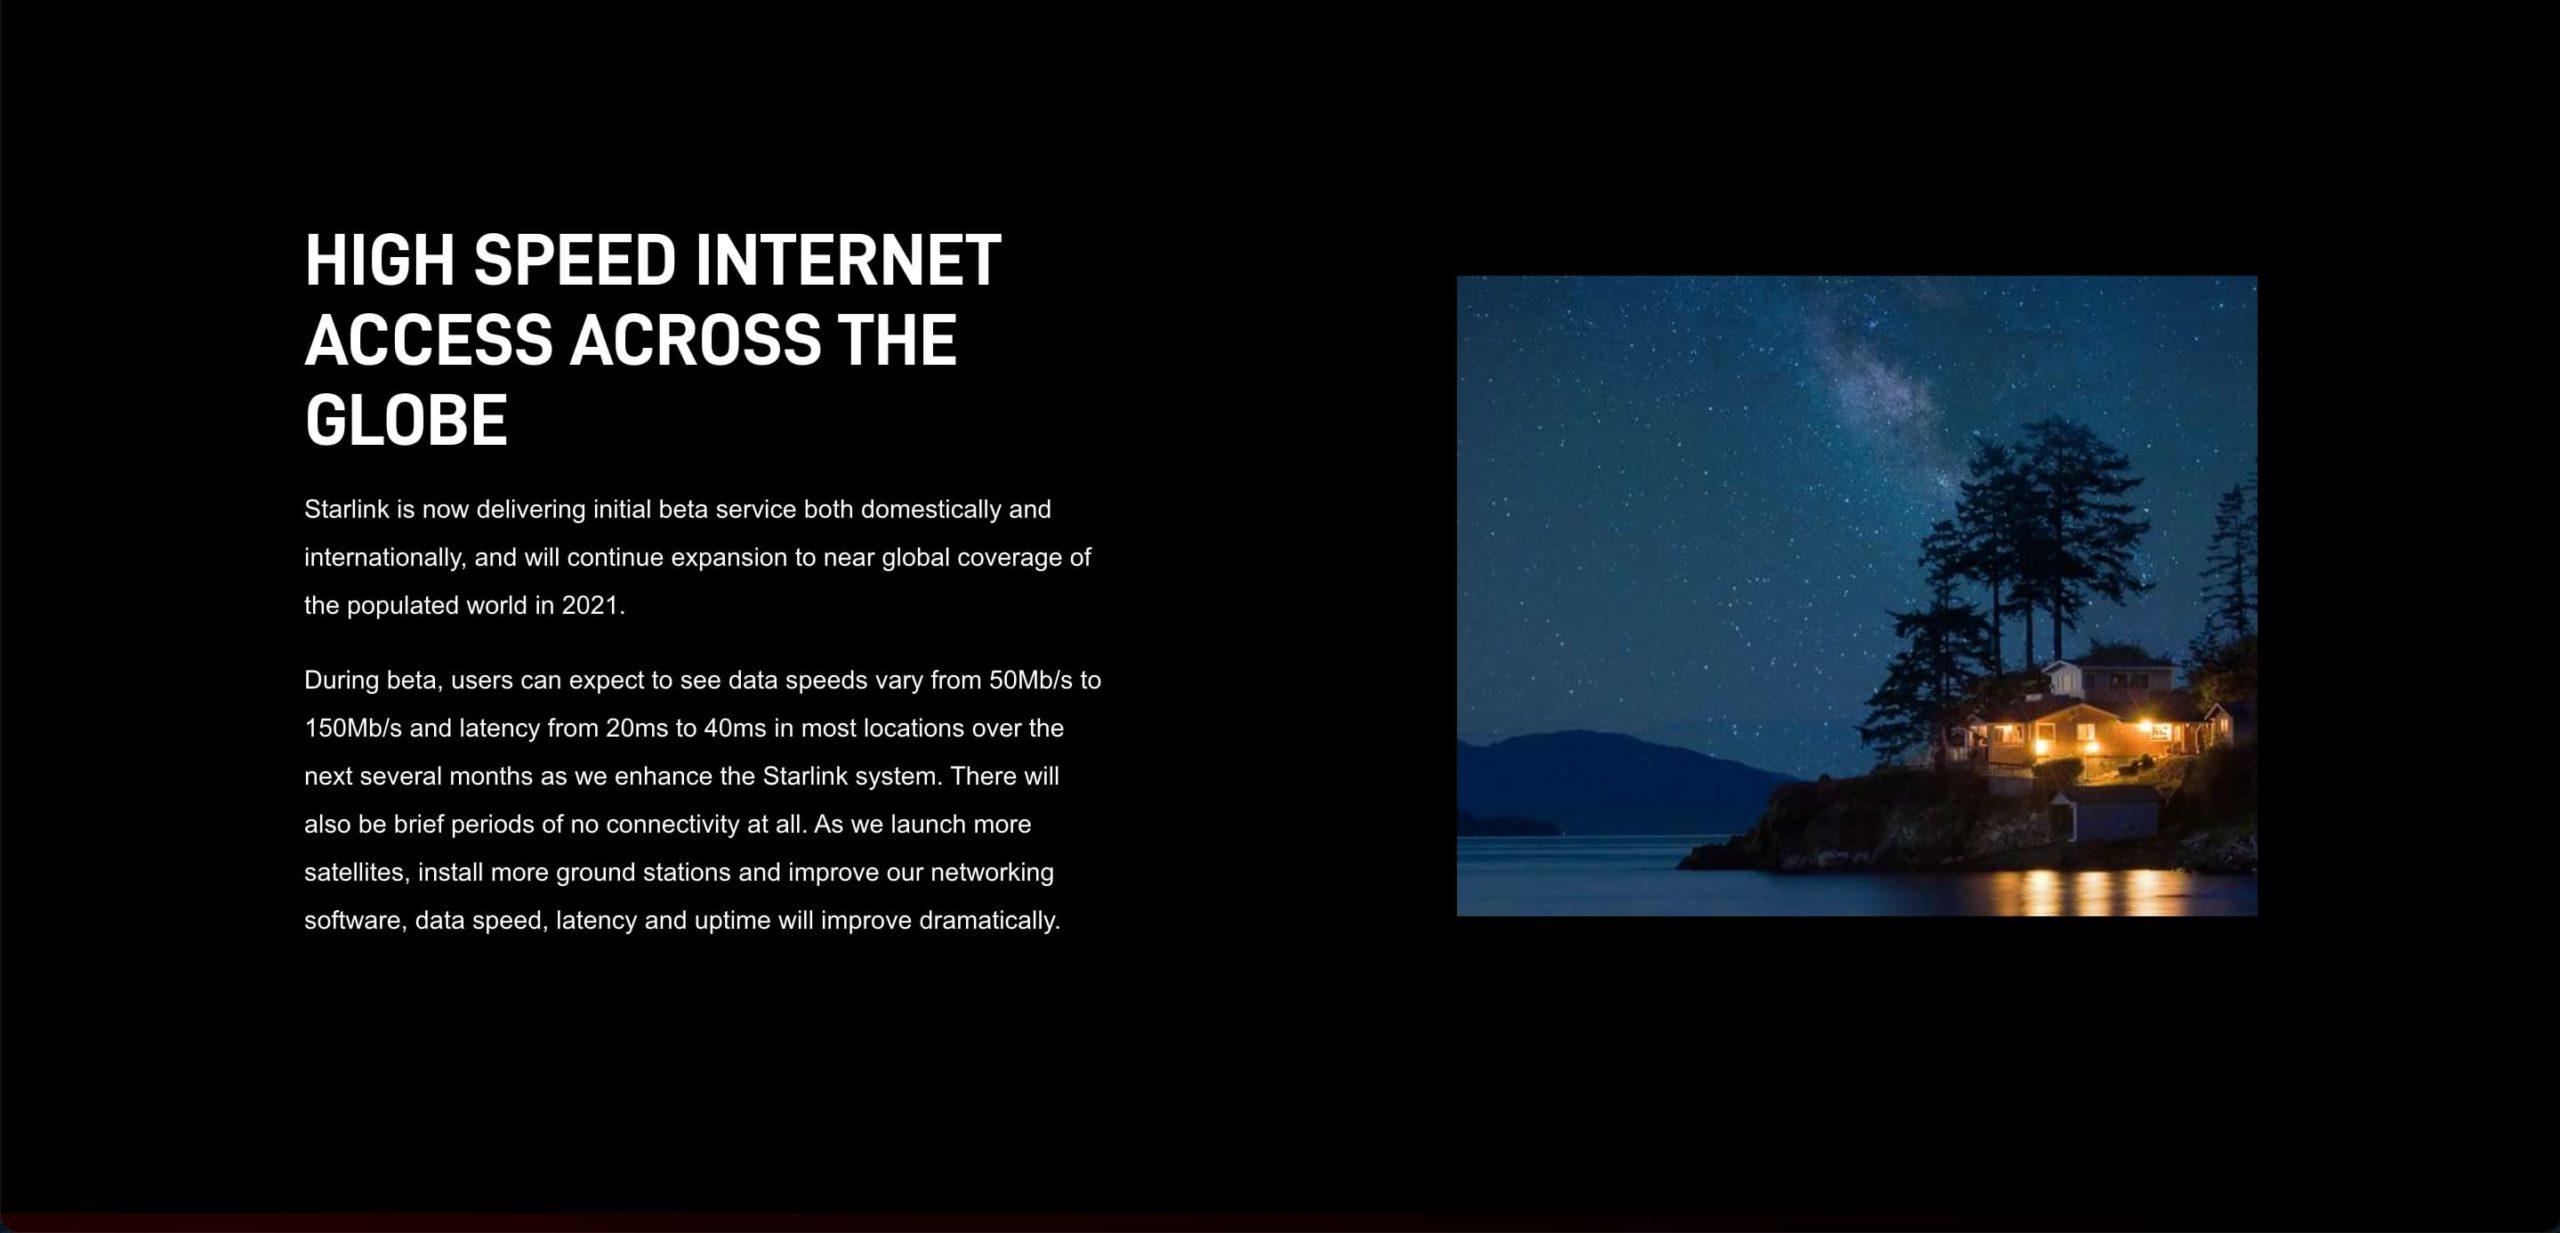 Screenshot-fünf-disruptive-innovationen-und-technologien-starlink